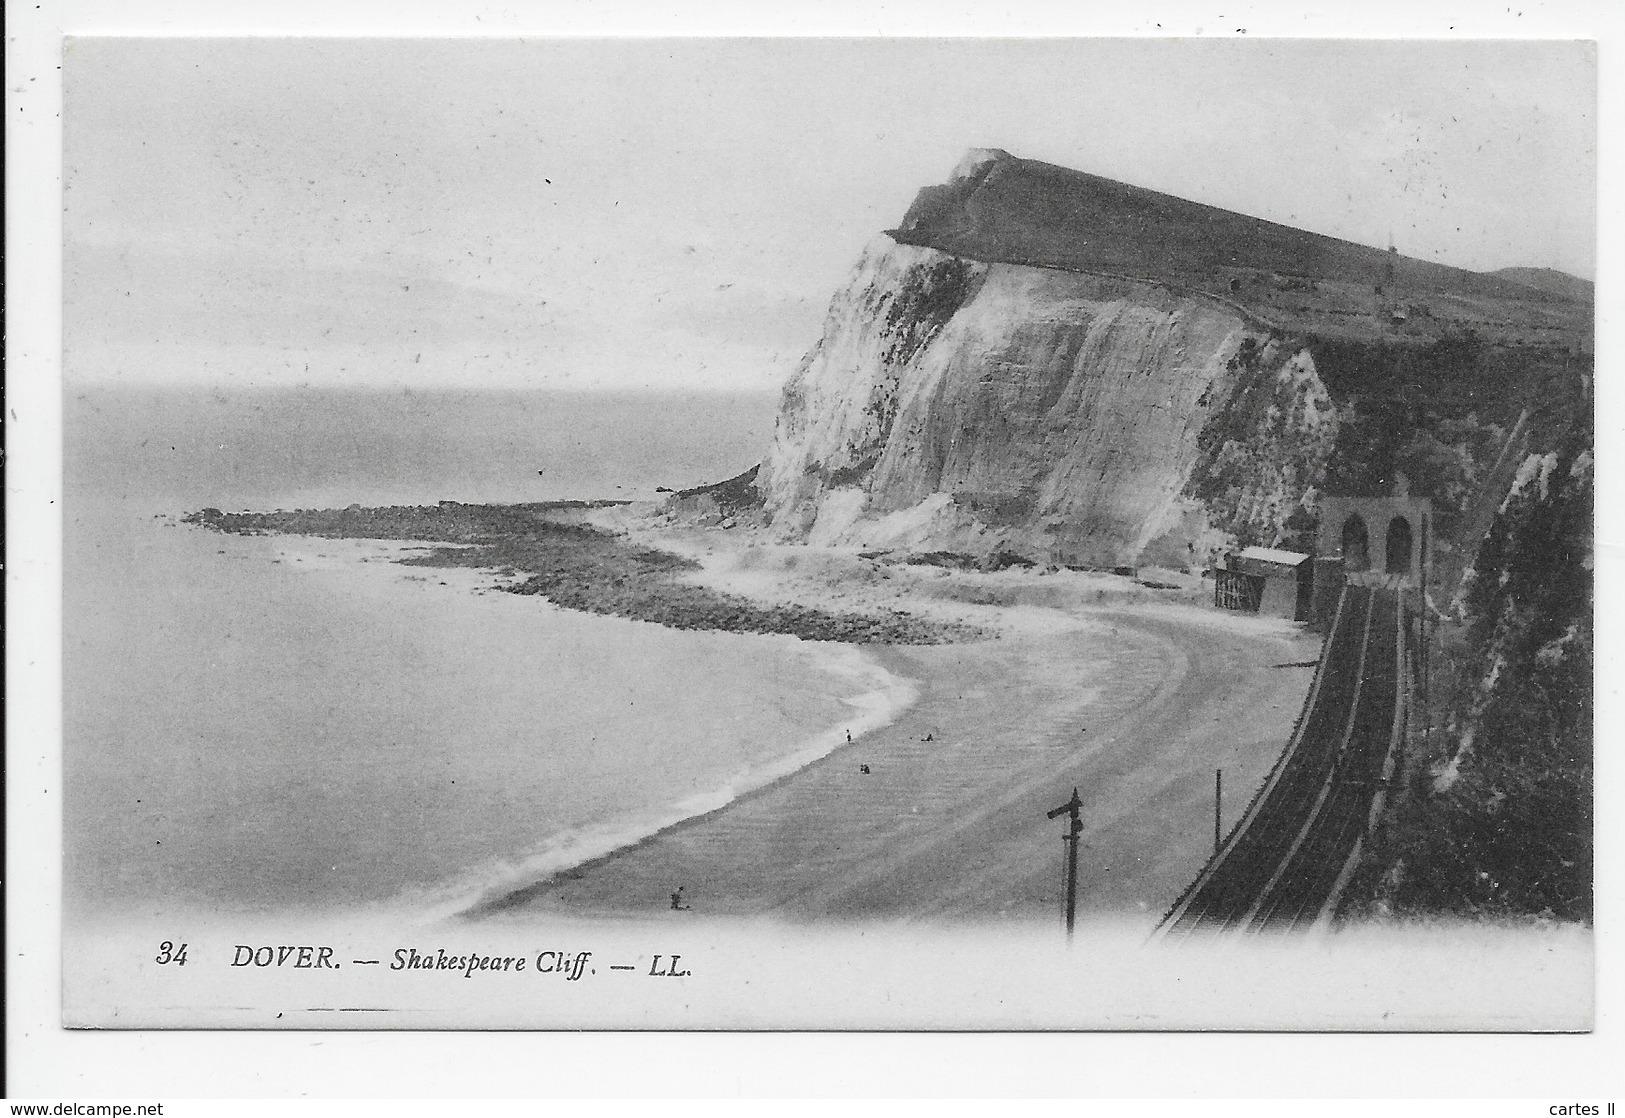 DC 1360 - DOVER - Shakespeare Cliff- LL 34 - Dover